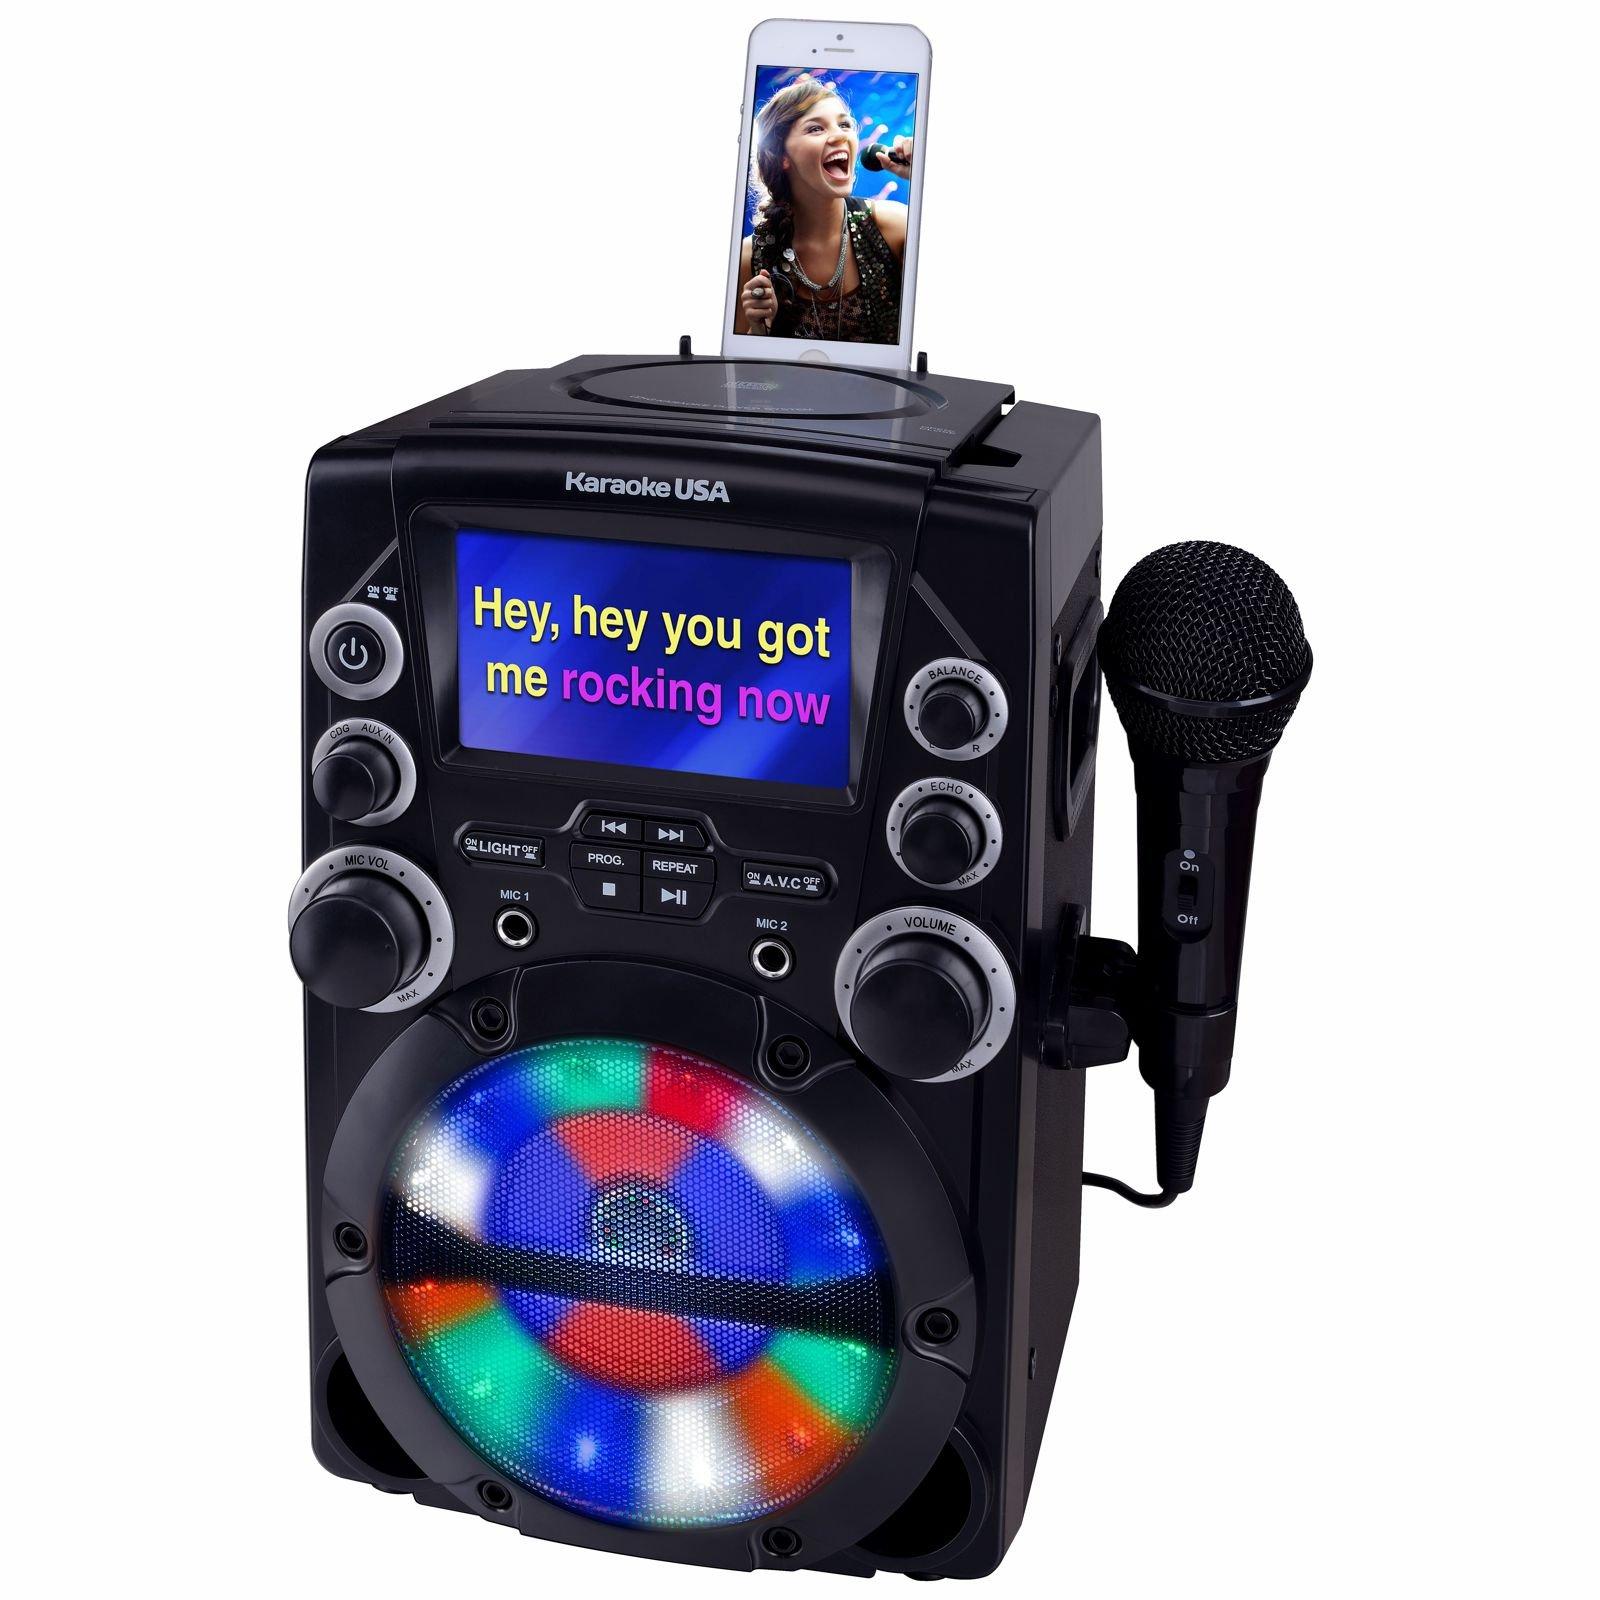 Karaoke USA GQ740 System Screen